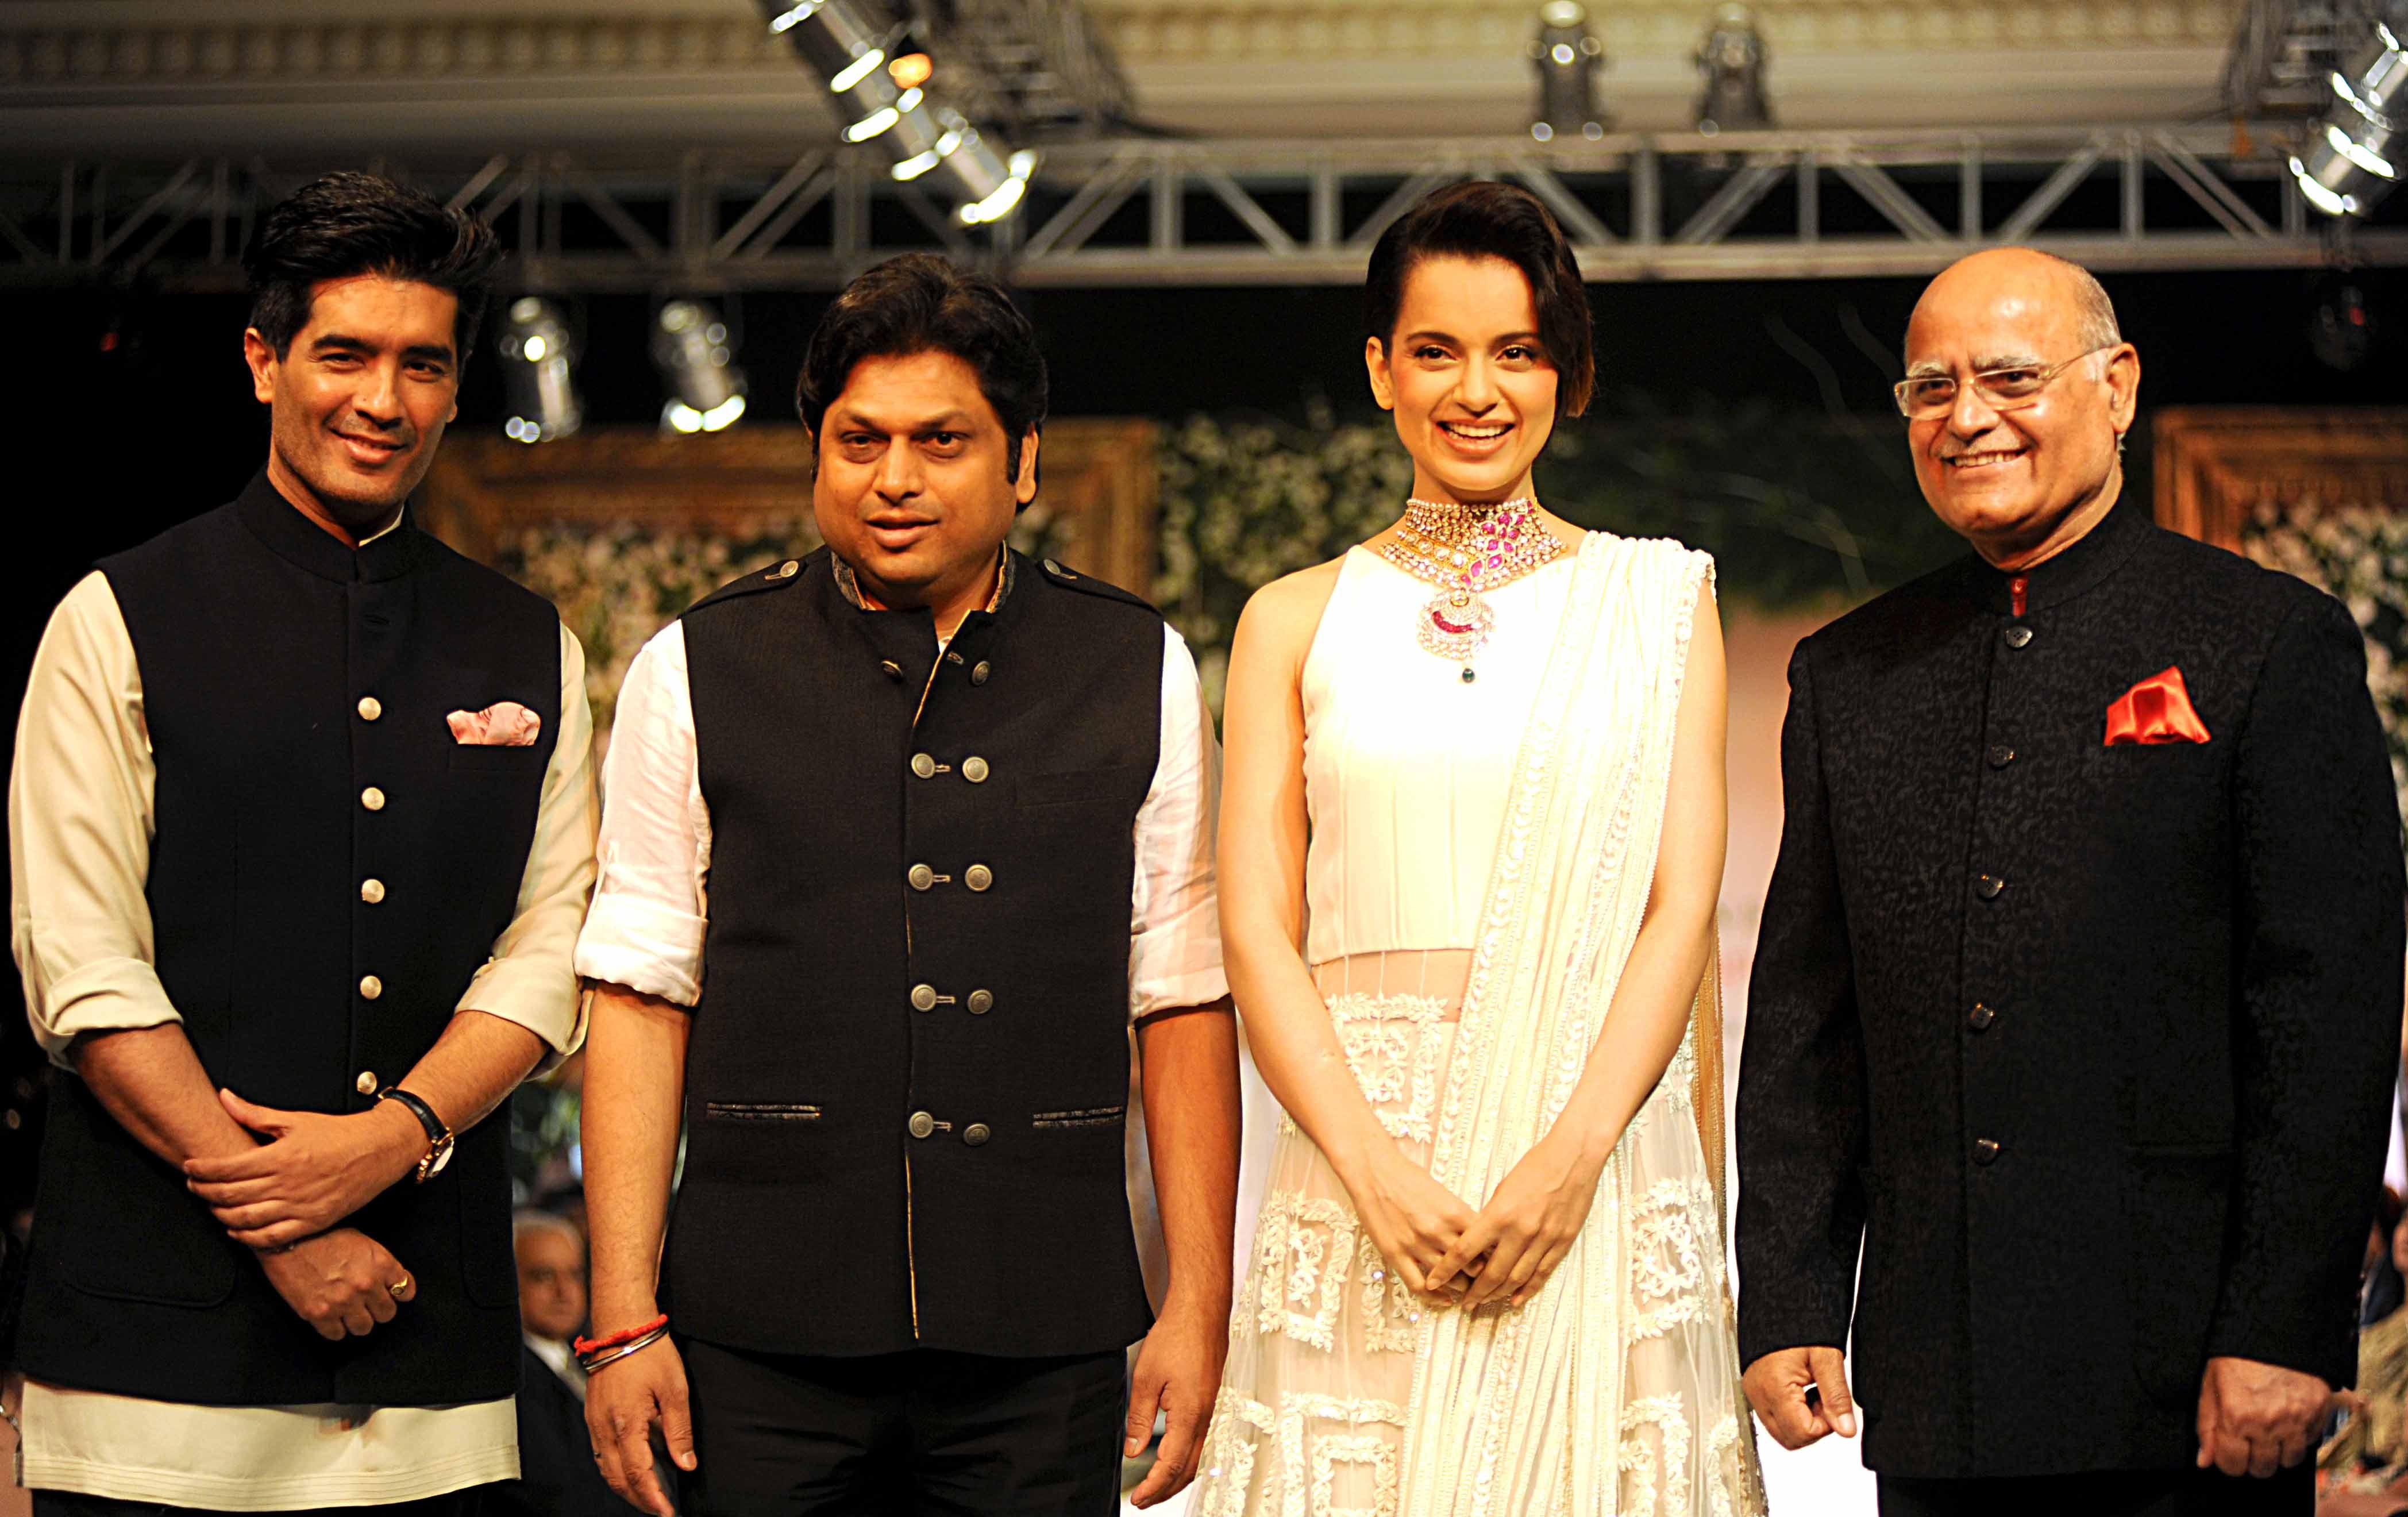 Manish Malhotra, Kangana Ranaut, MD PC Jeweller Balram Garg, editorial director TNIE Prabhu Chawala